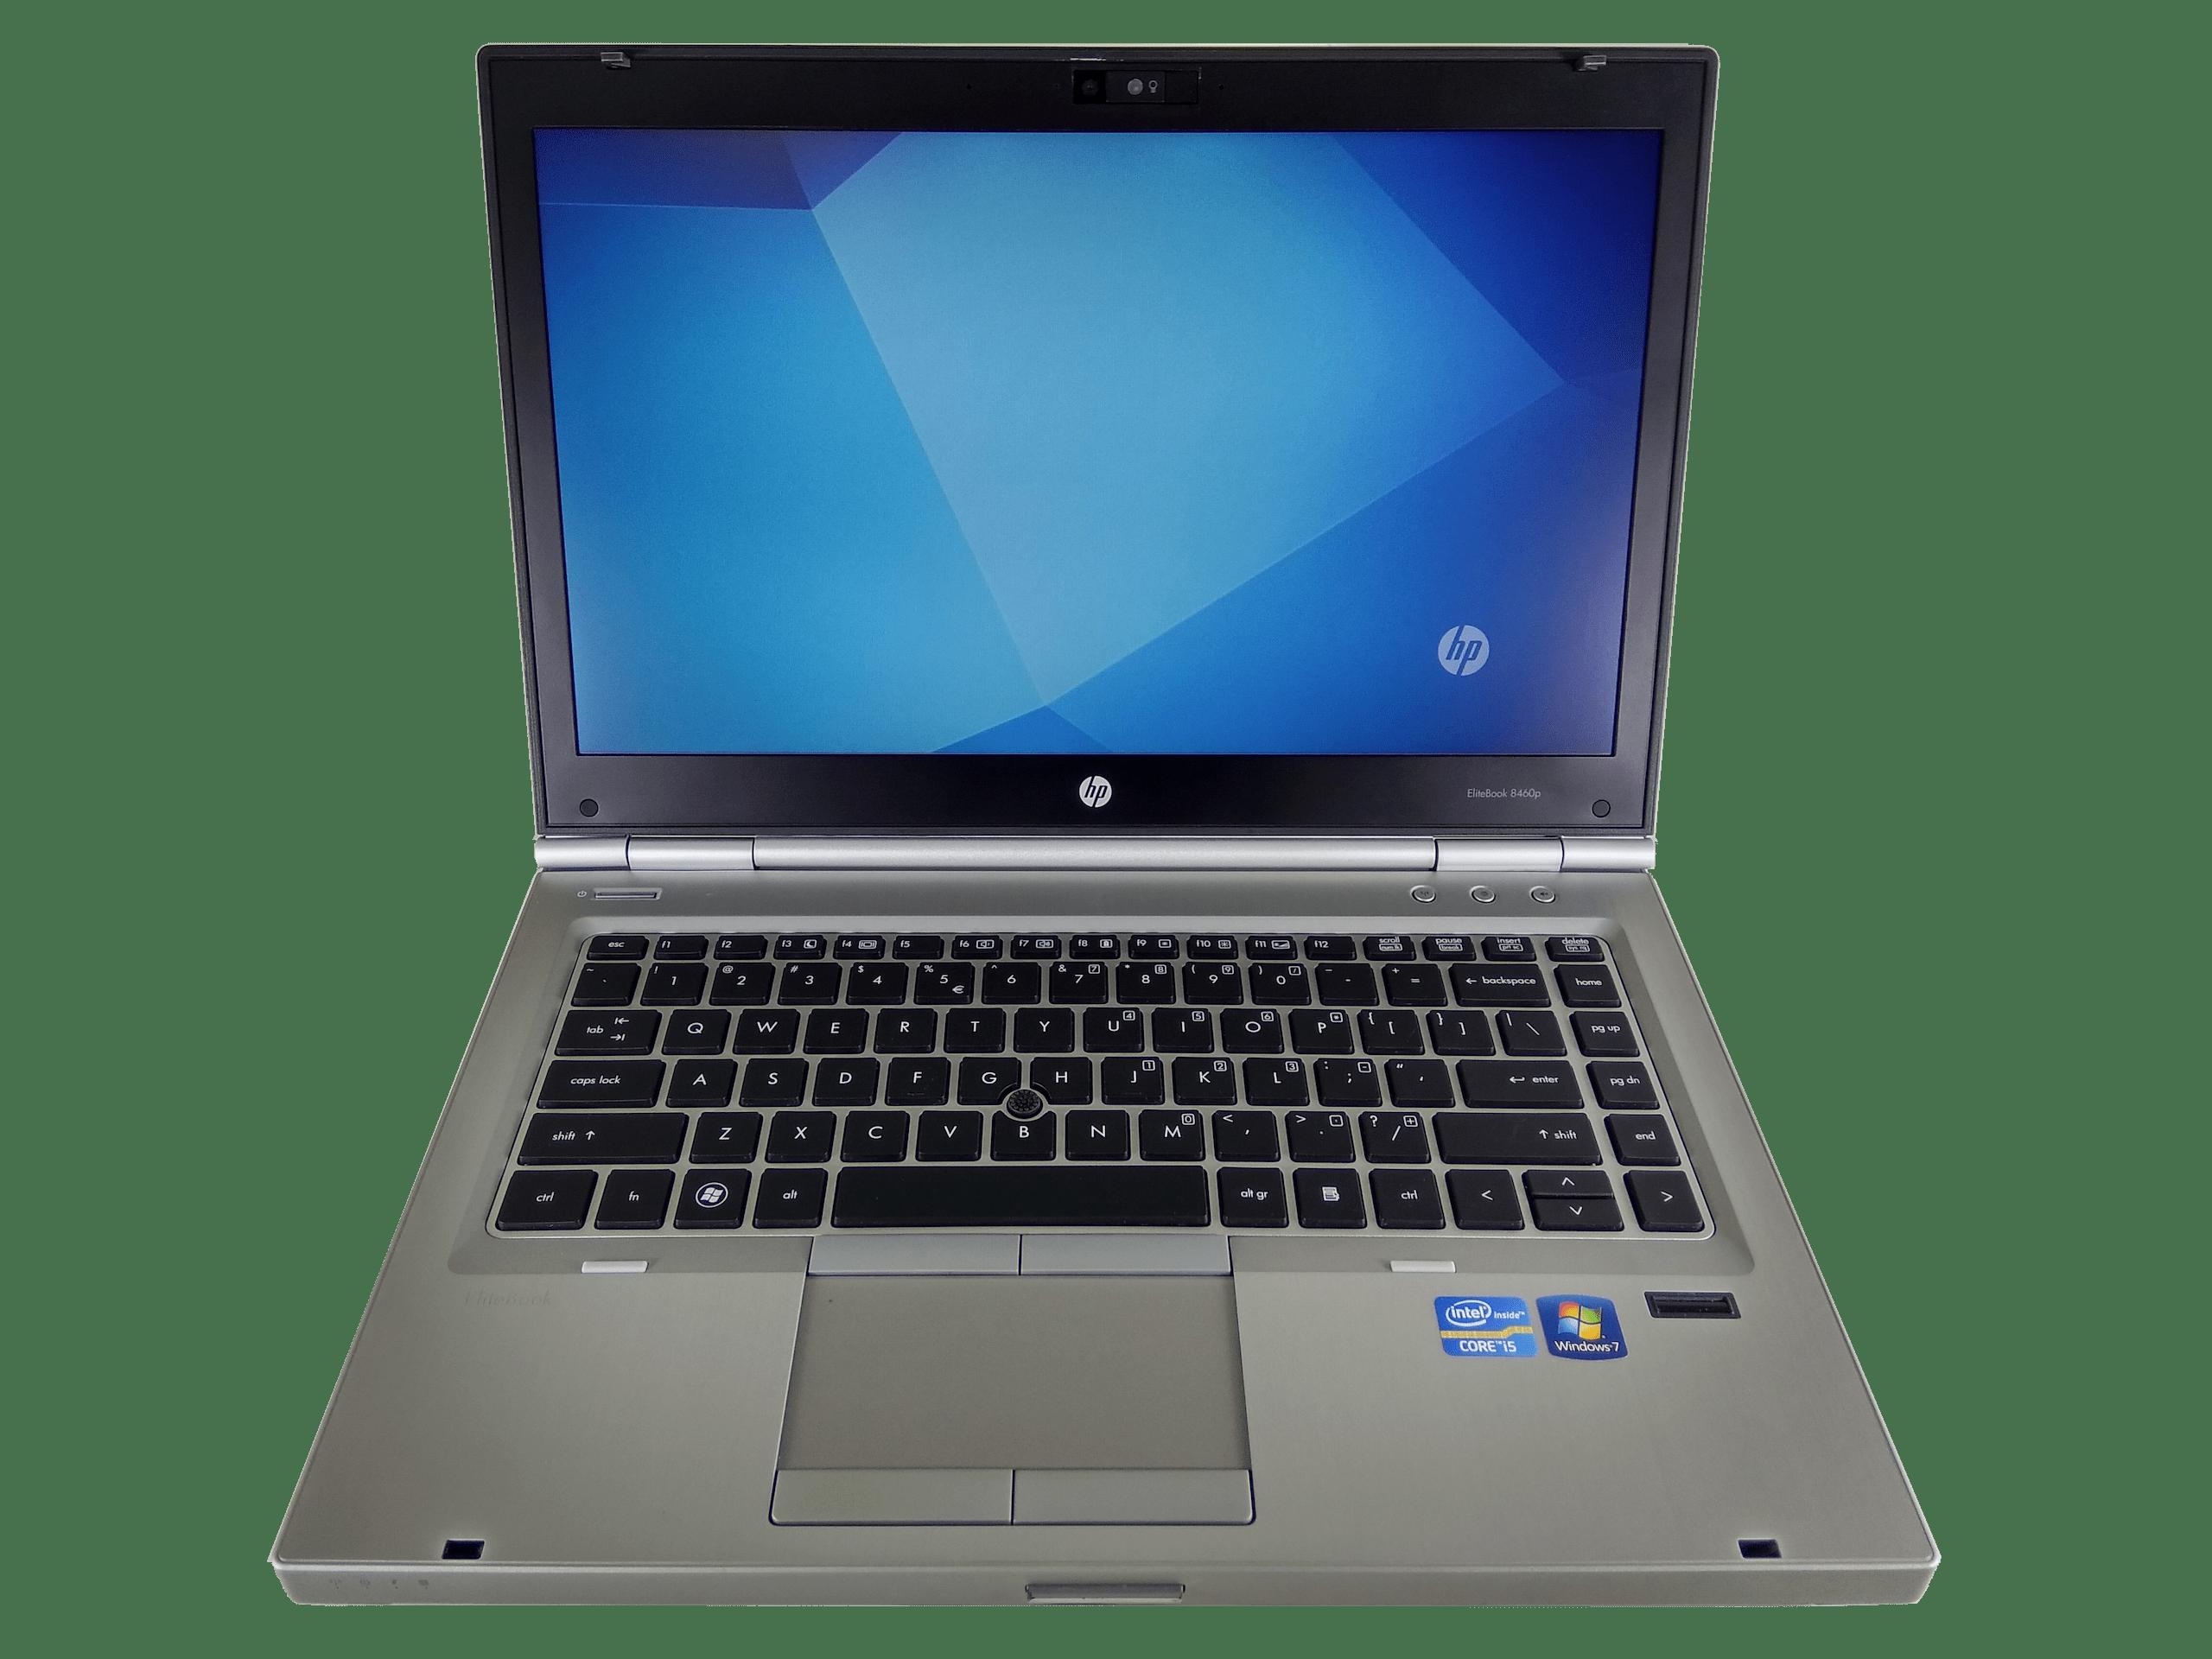 Laptop goedkoopste